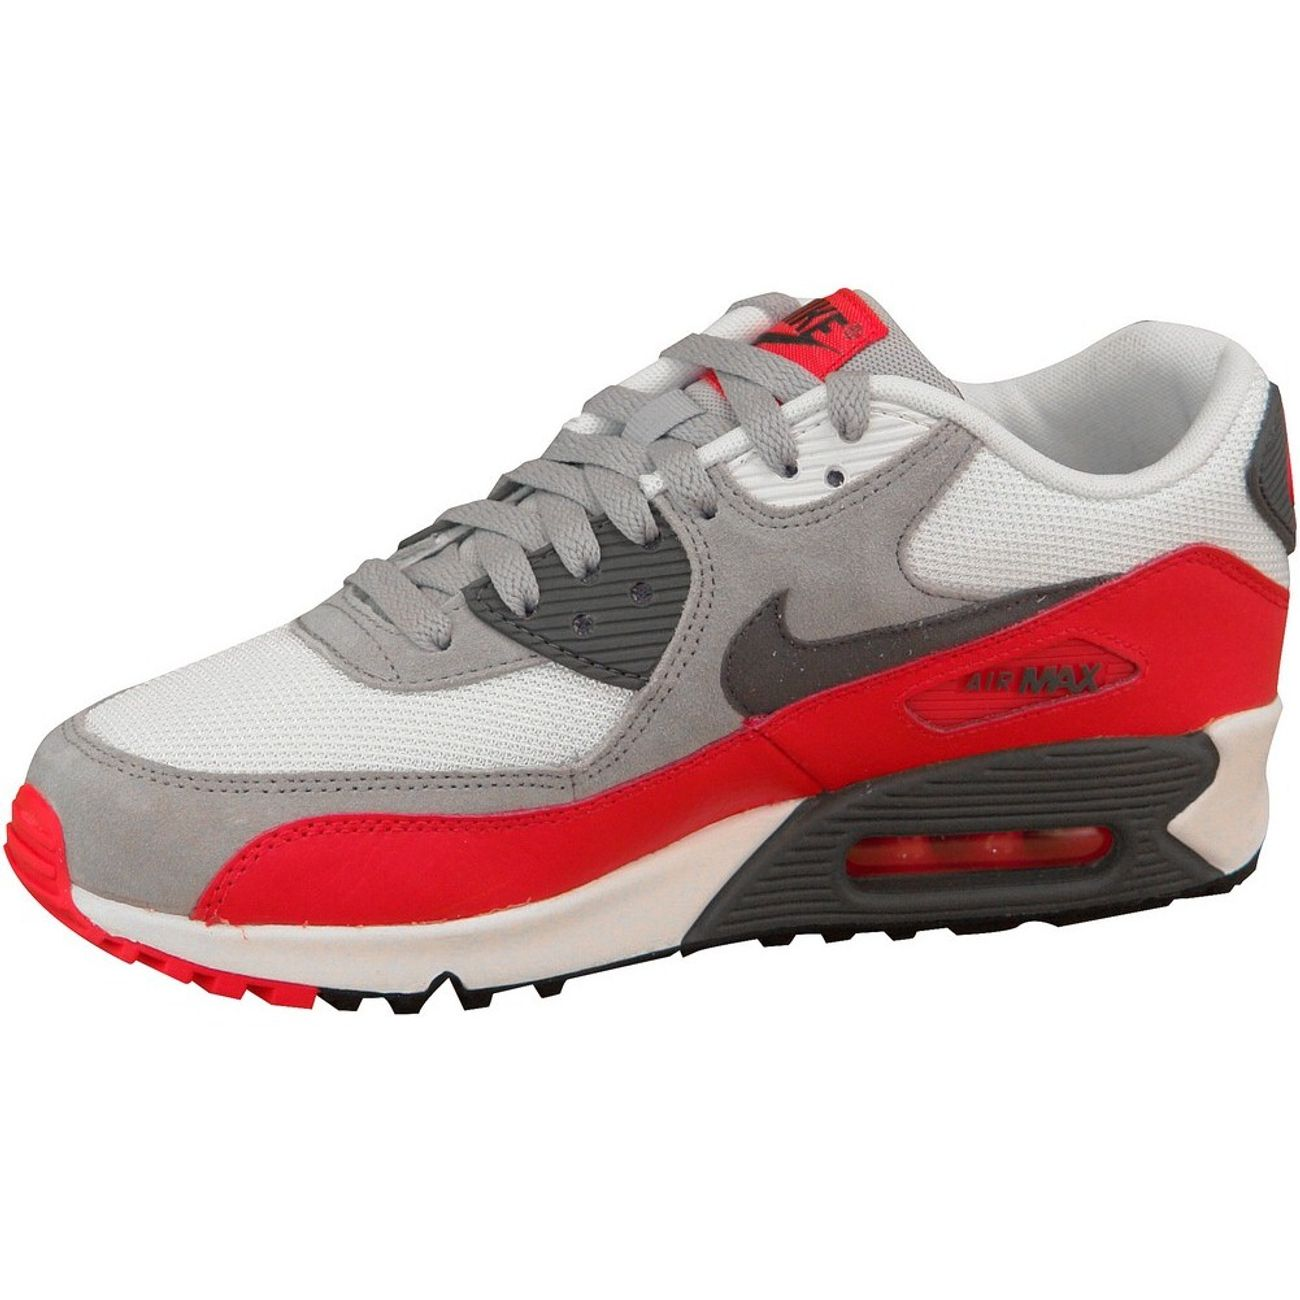 ModeLifestyle rouge 003 Blanc Gs Max Air Nike U Baskets 90 705499 gris Enfant f6ygYvIb7